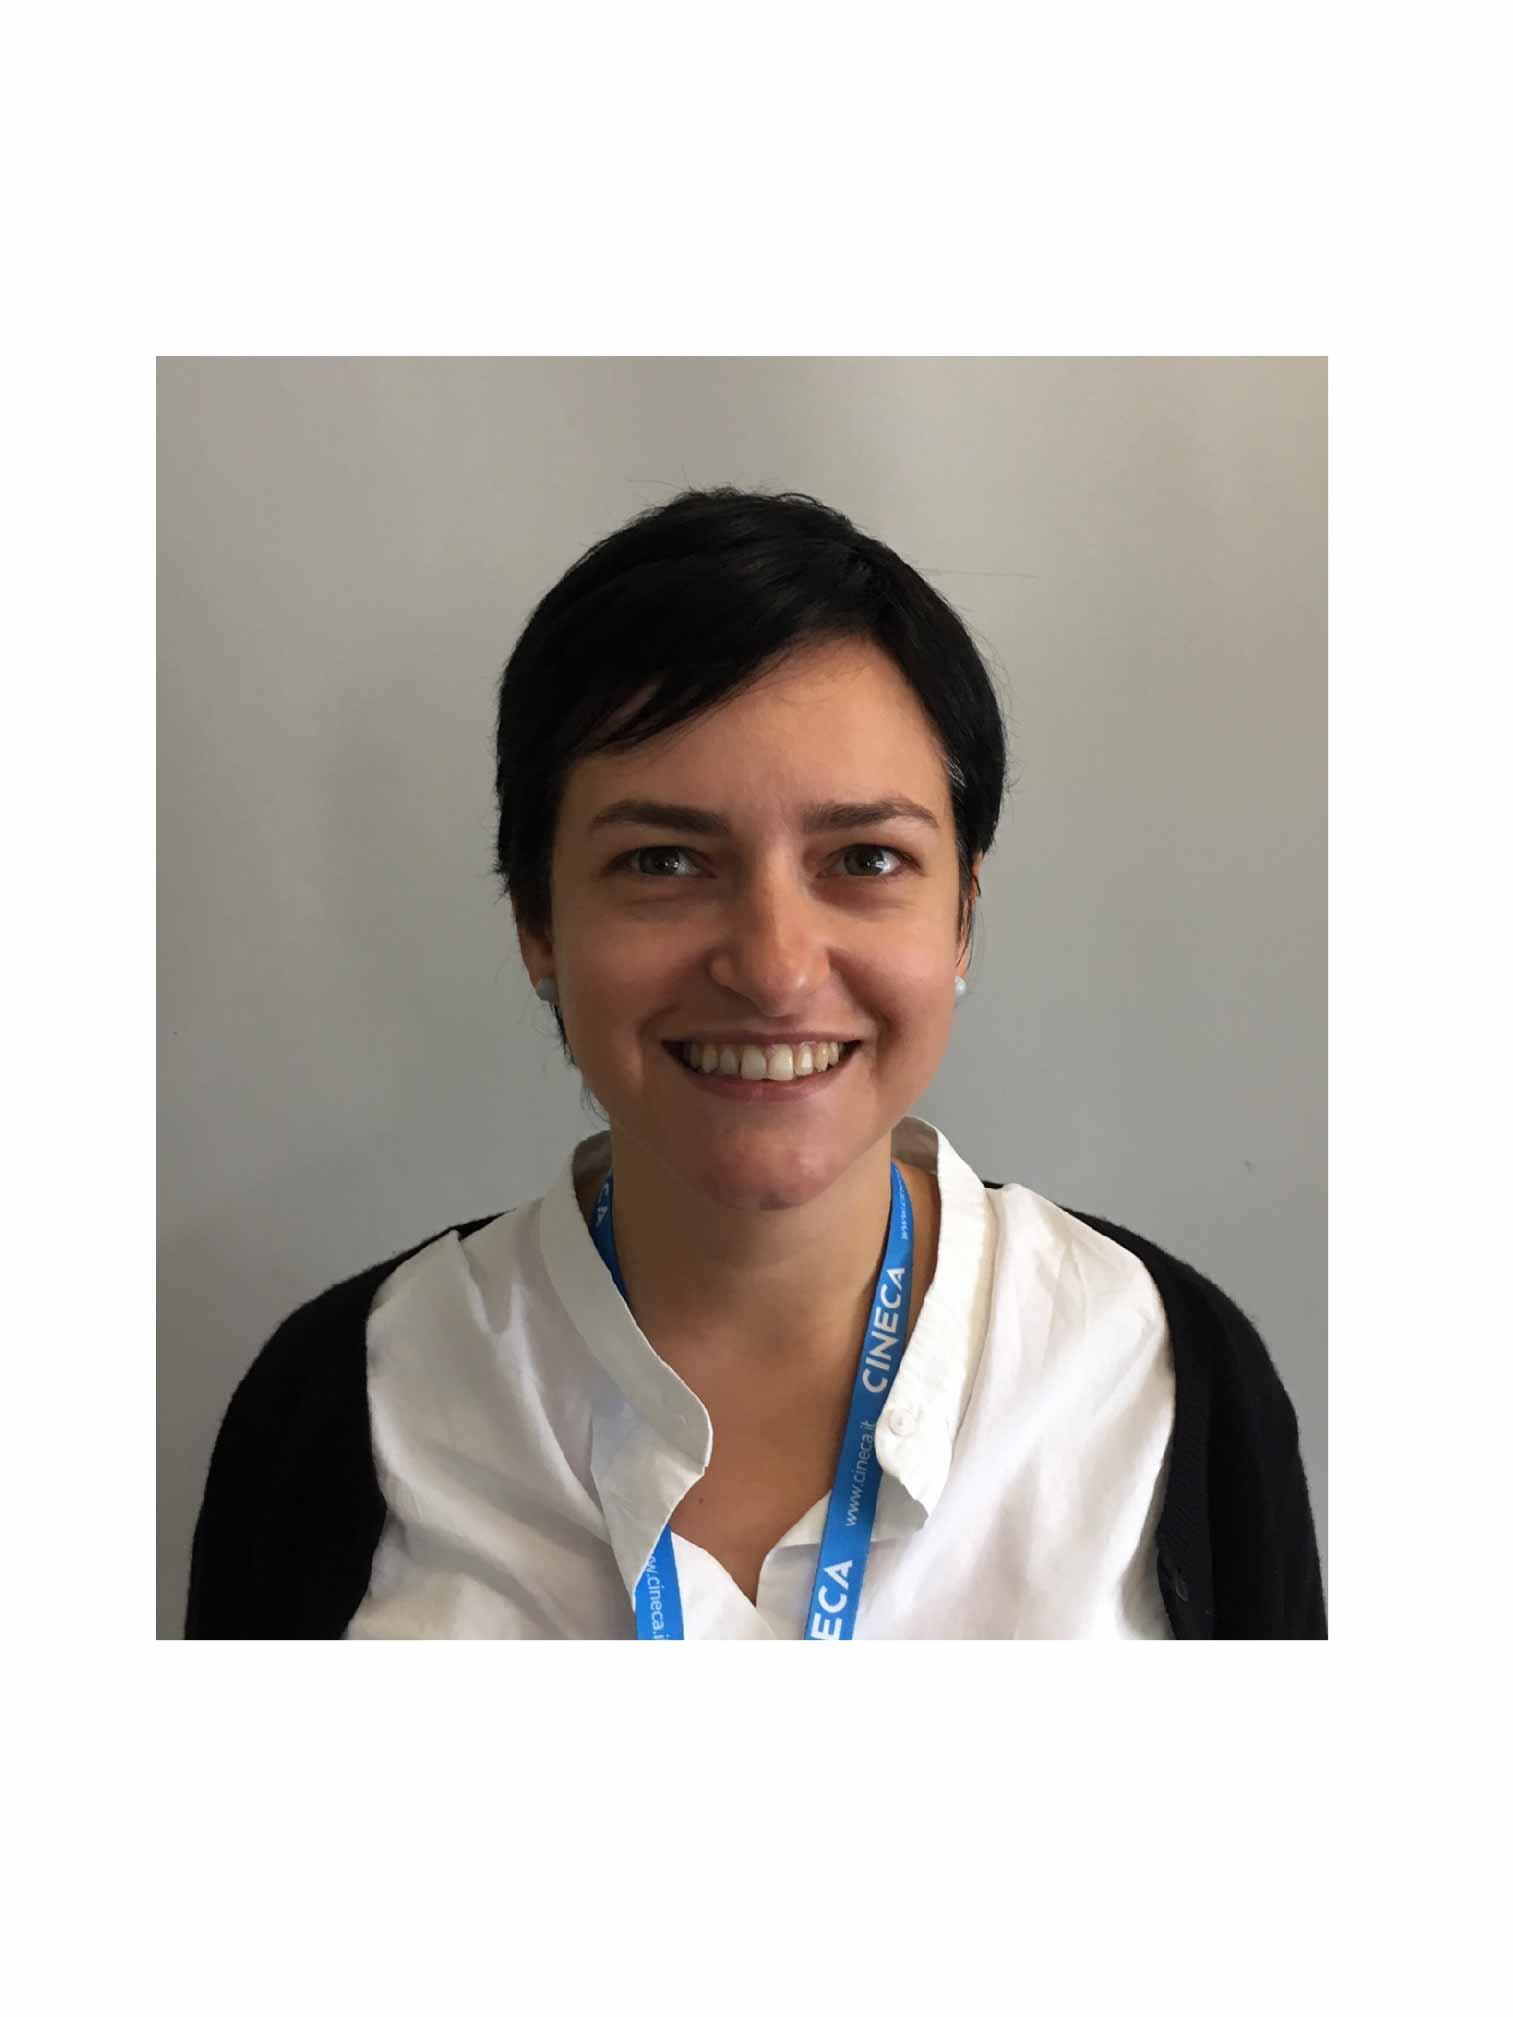 Elisabetta Boella